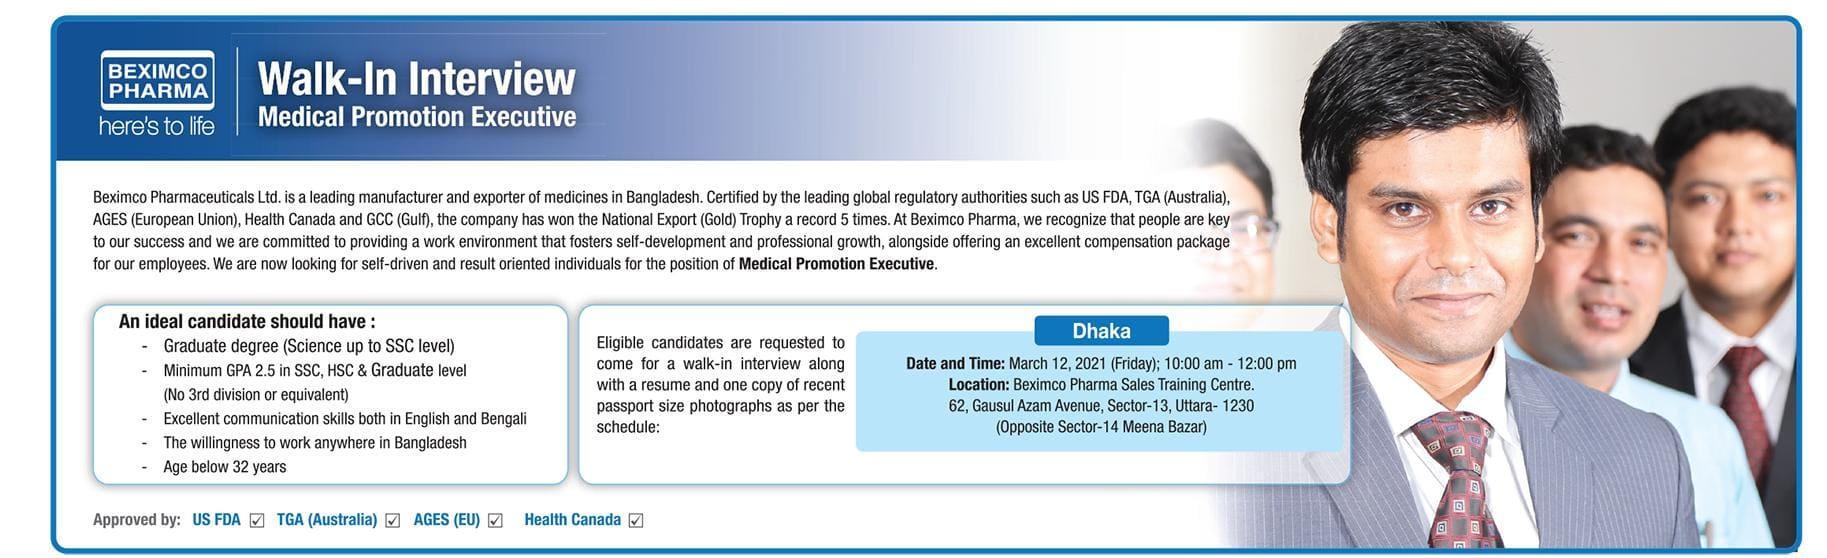 Beximco Pharmaceuticals Job Circular 2021